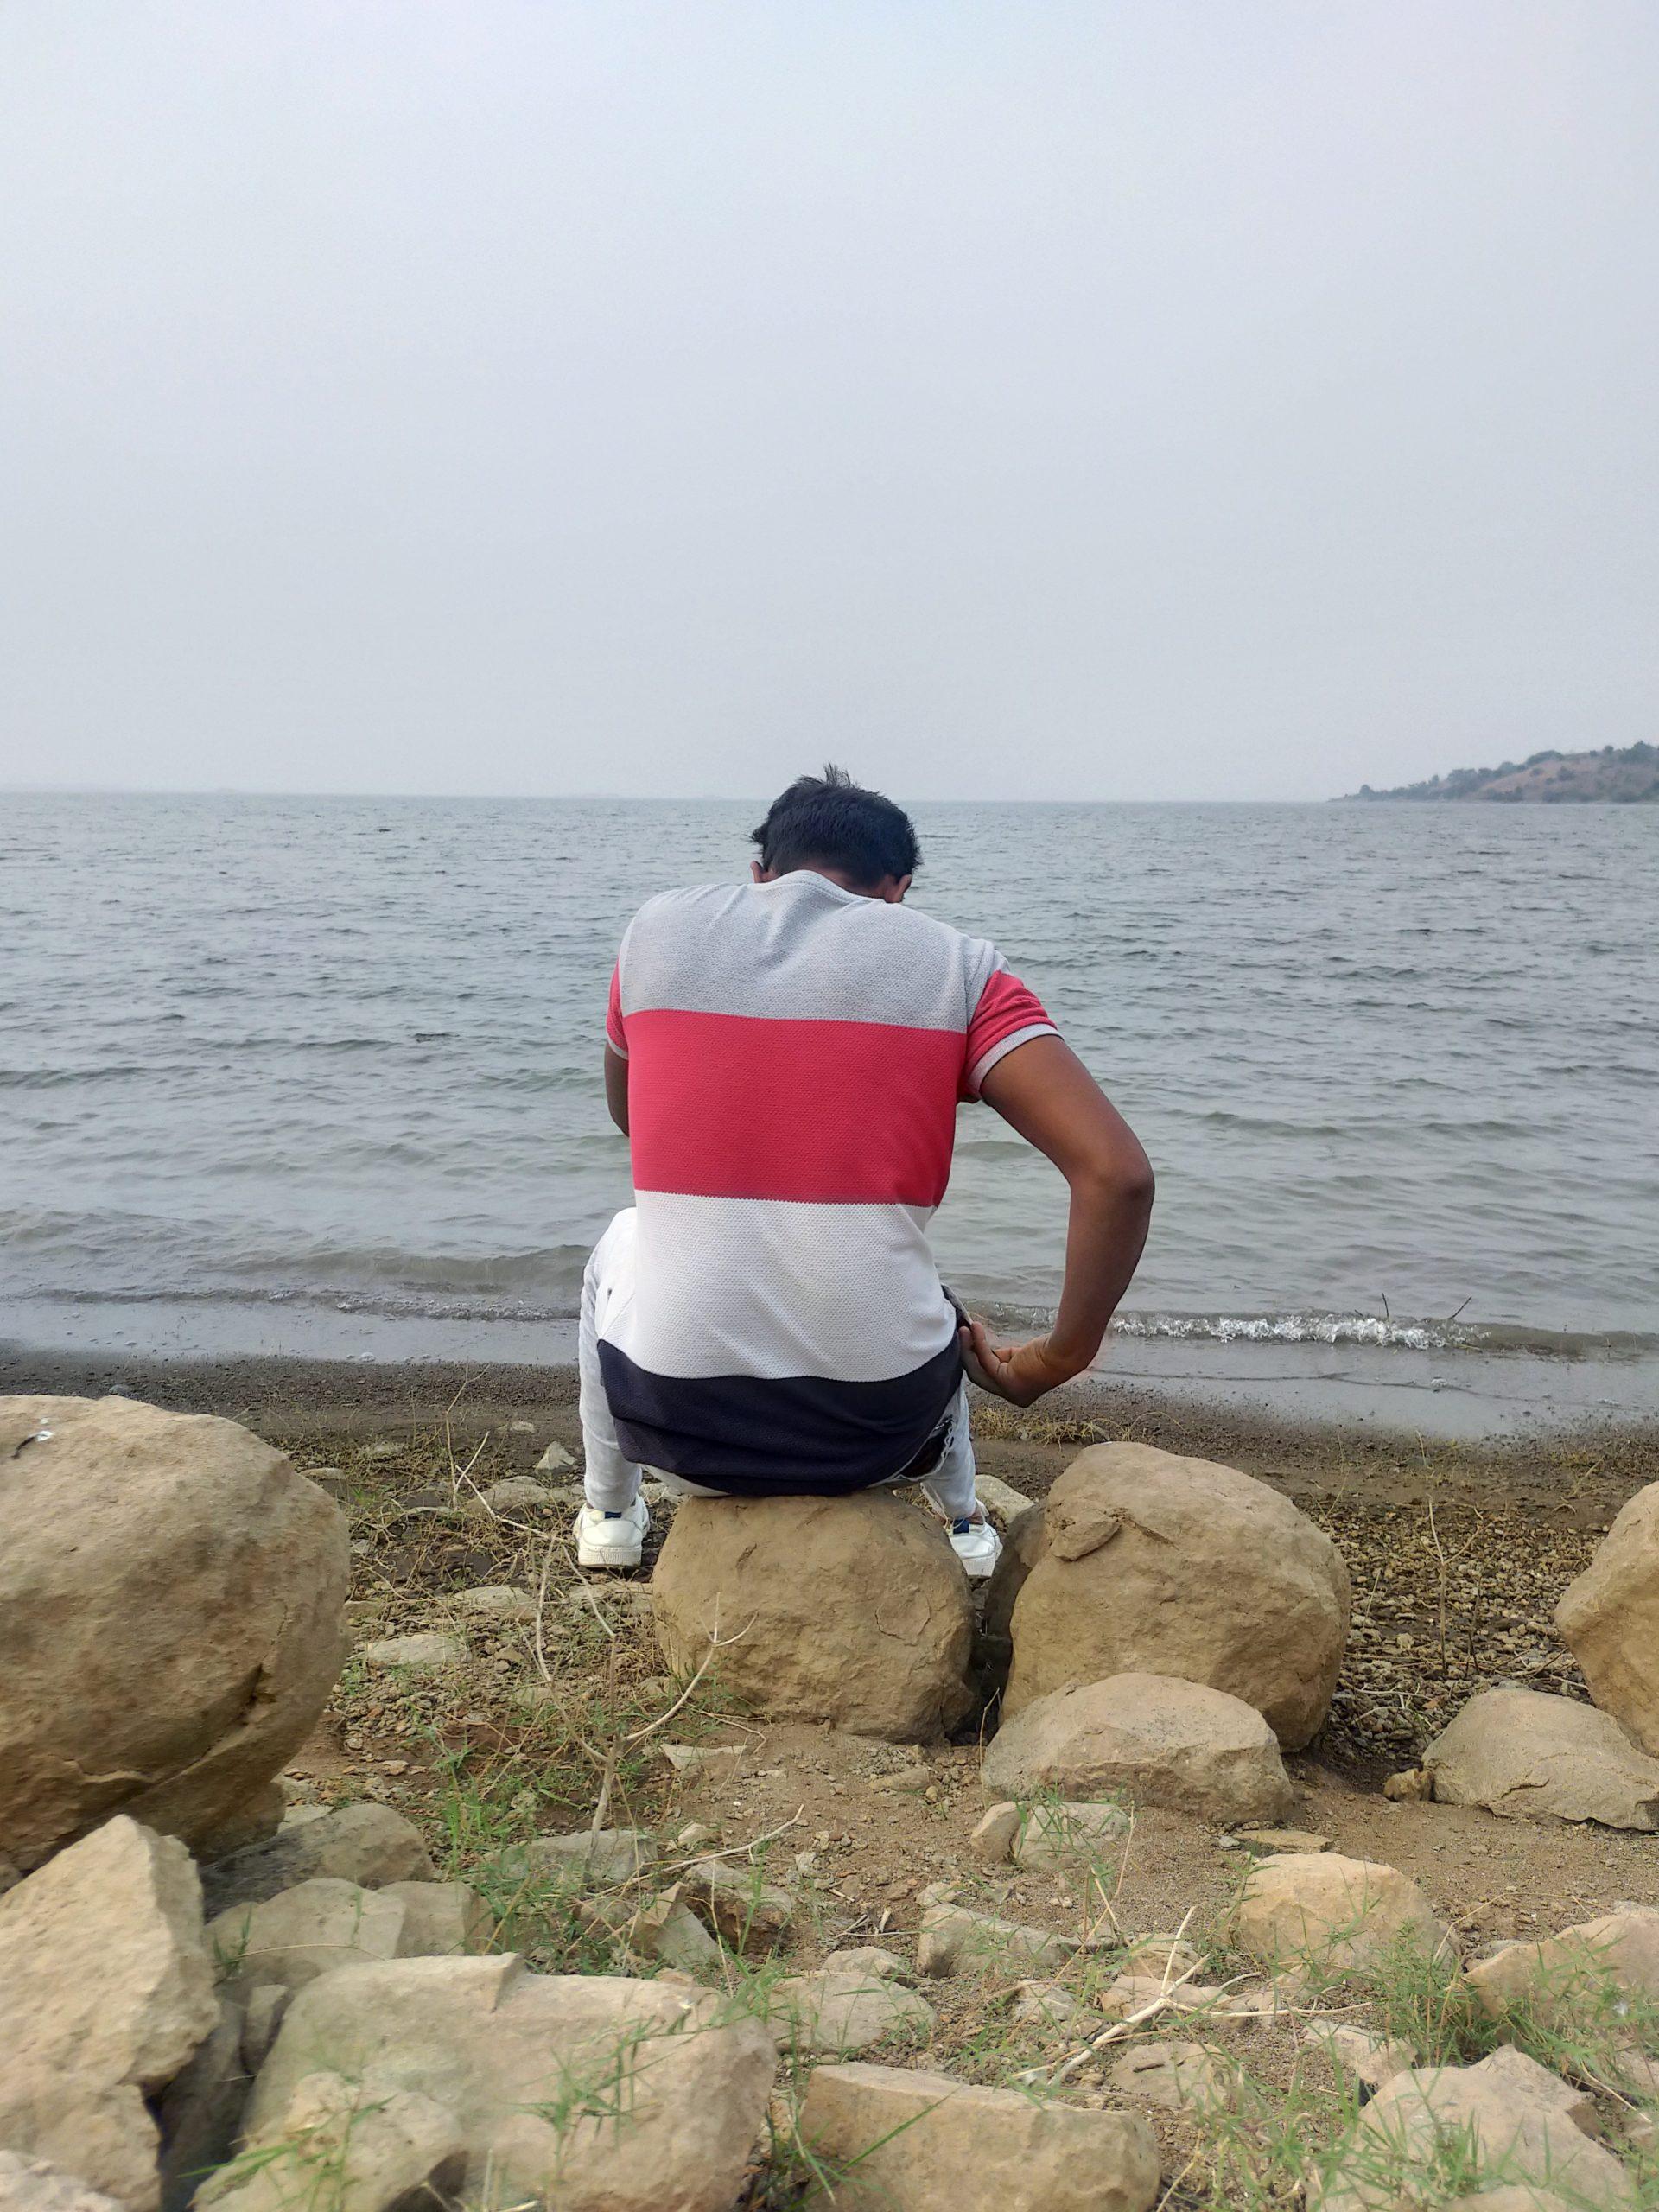 A boy on a beach